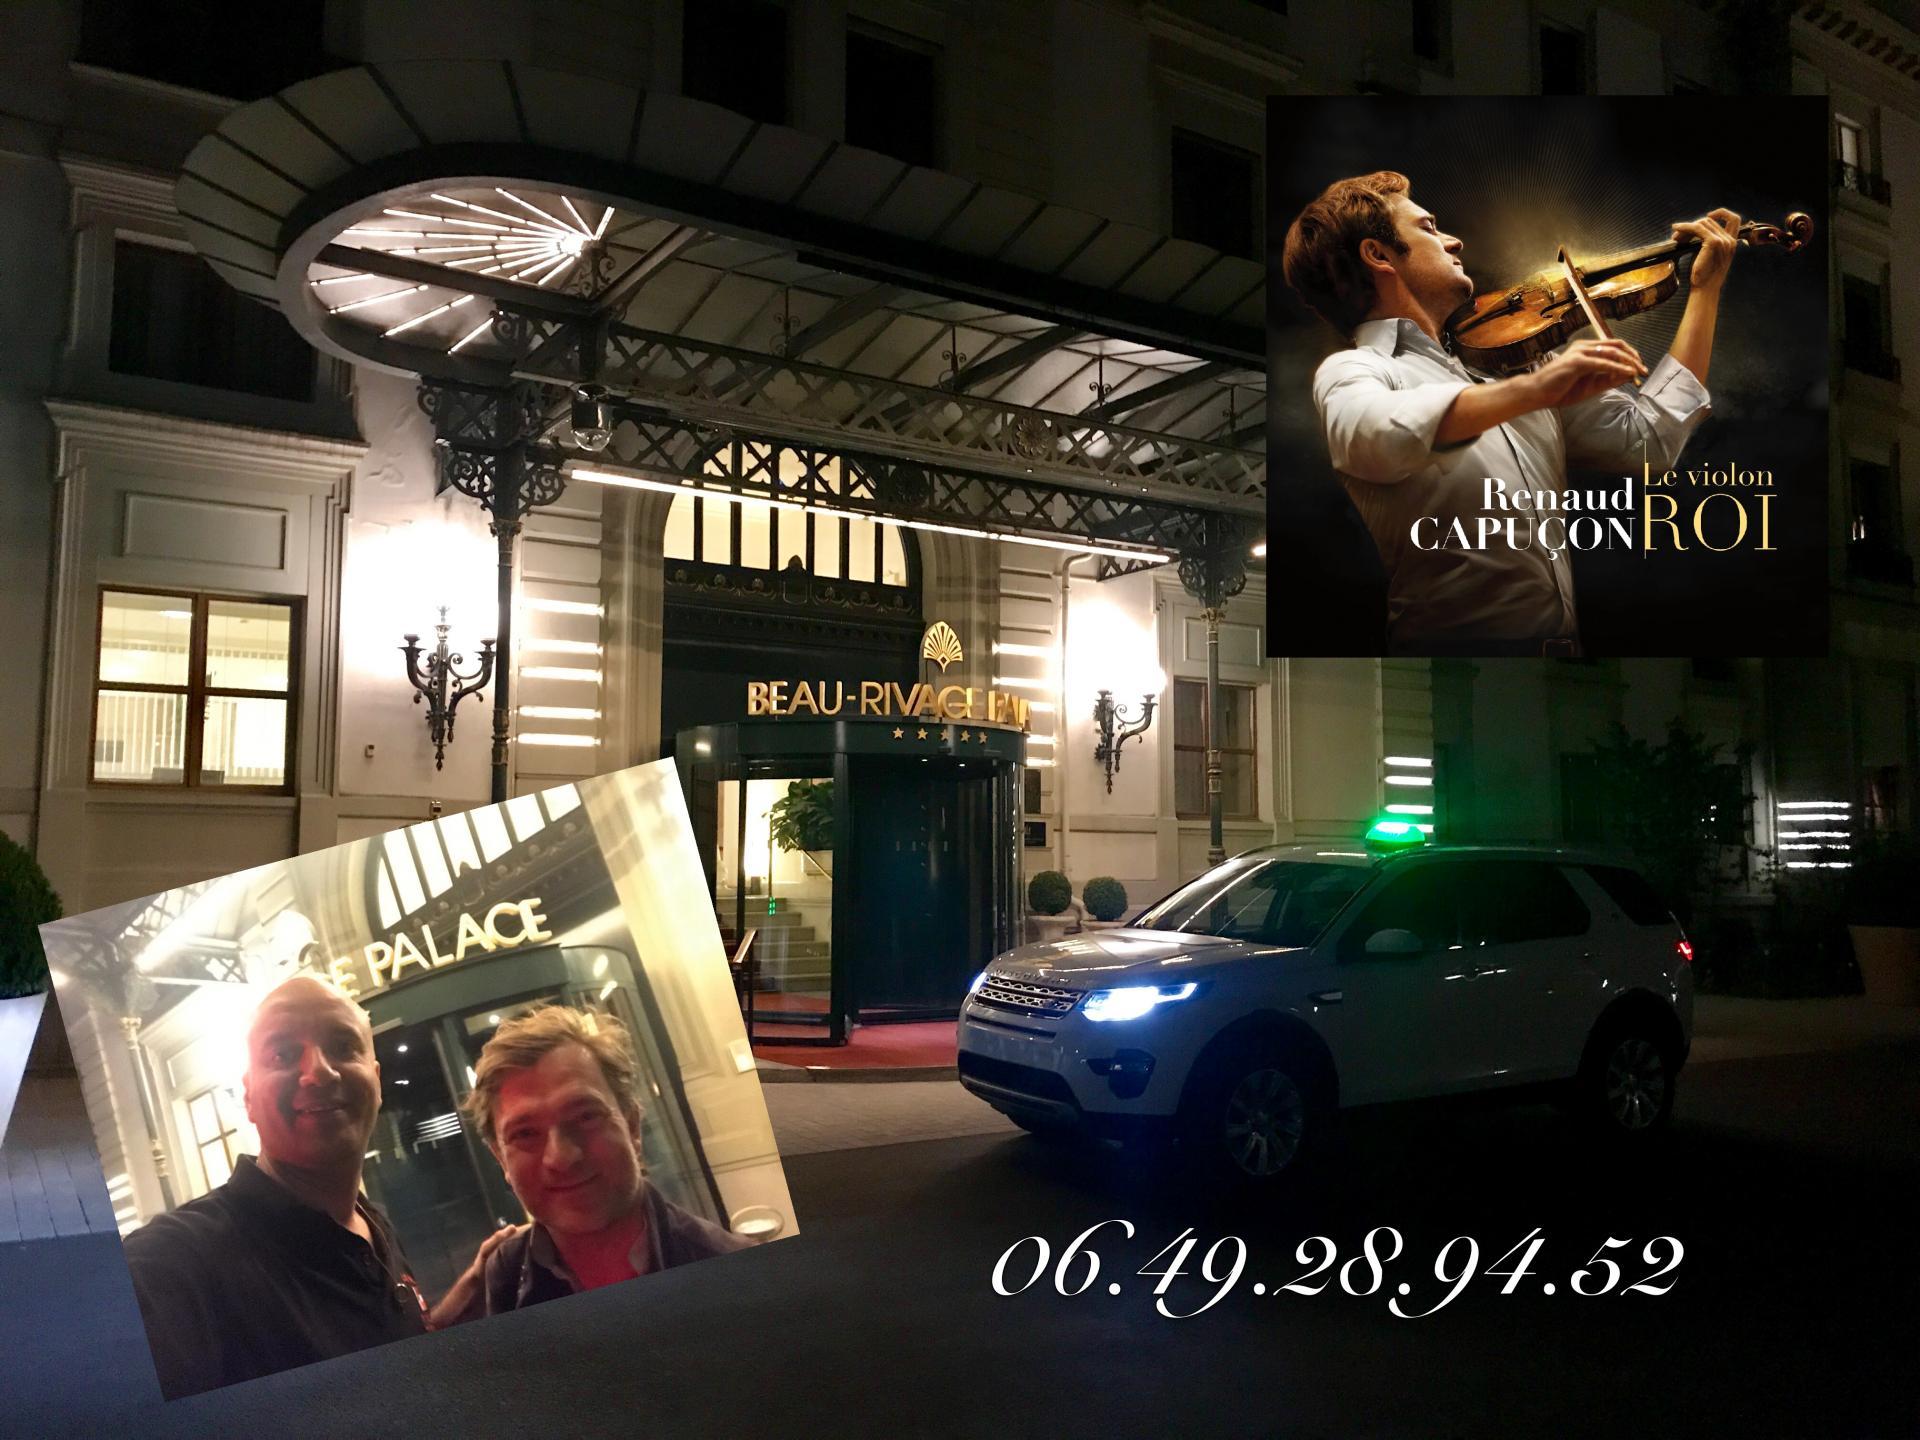 Taxi VIP Di Tullio: 06.49.28.94.52